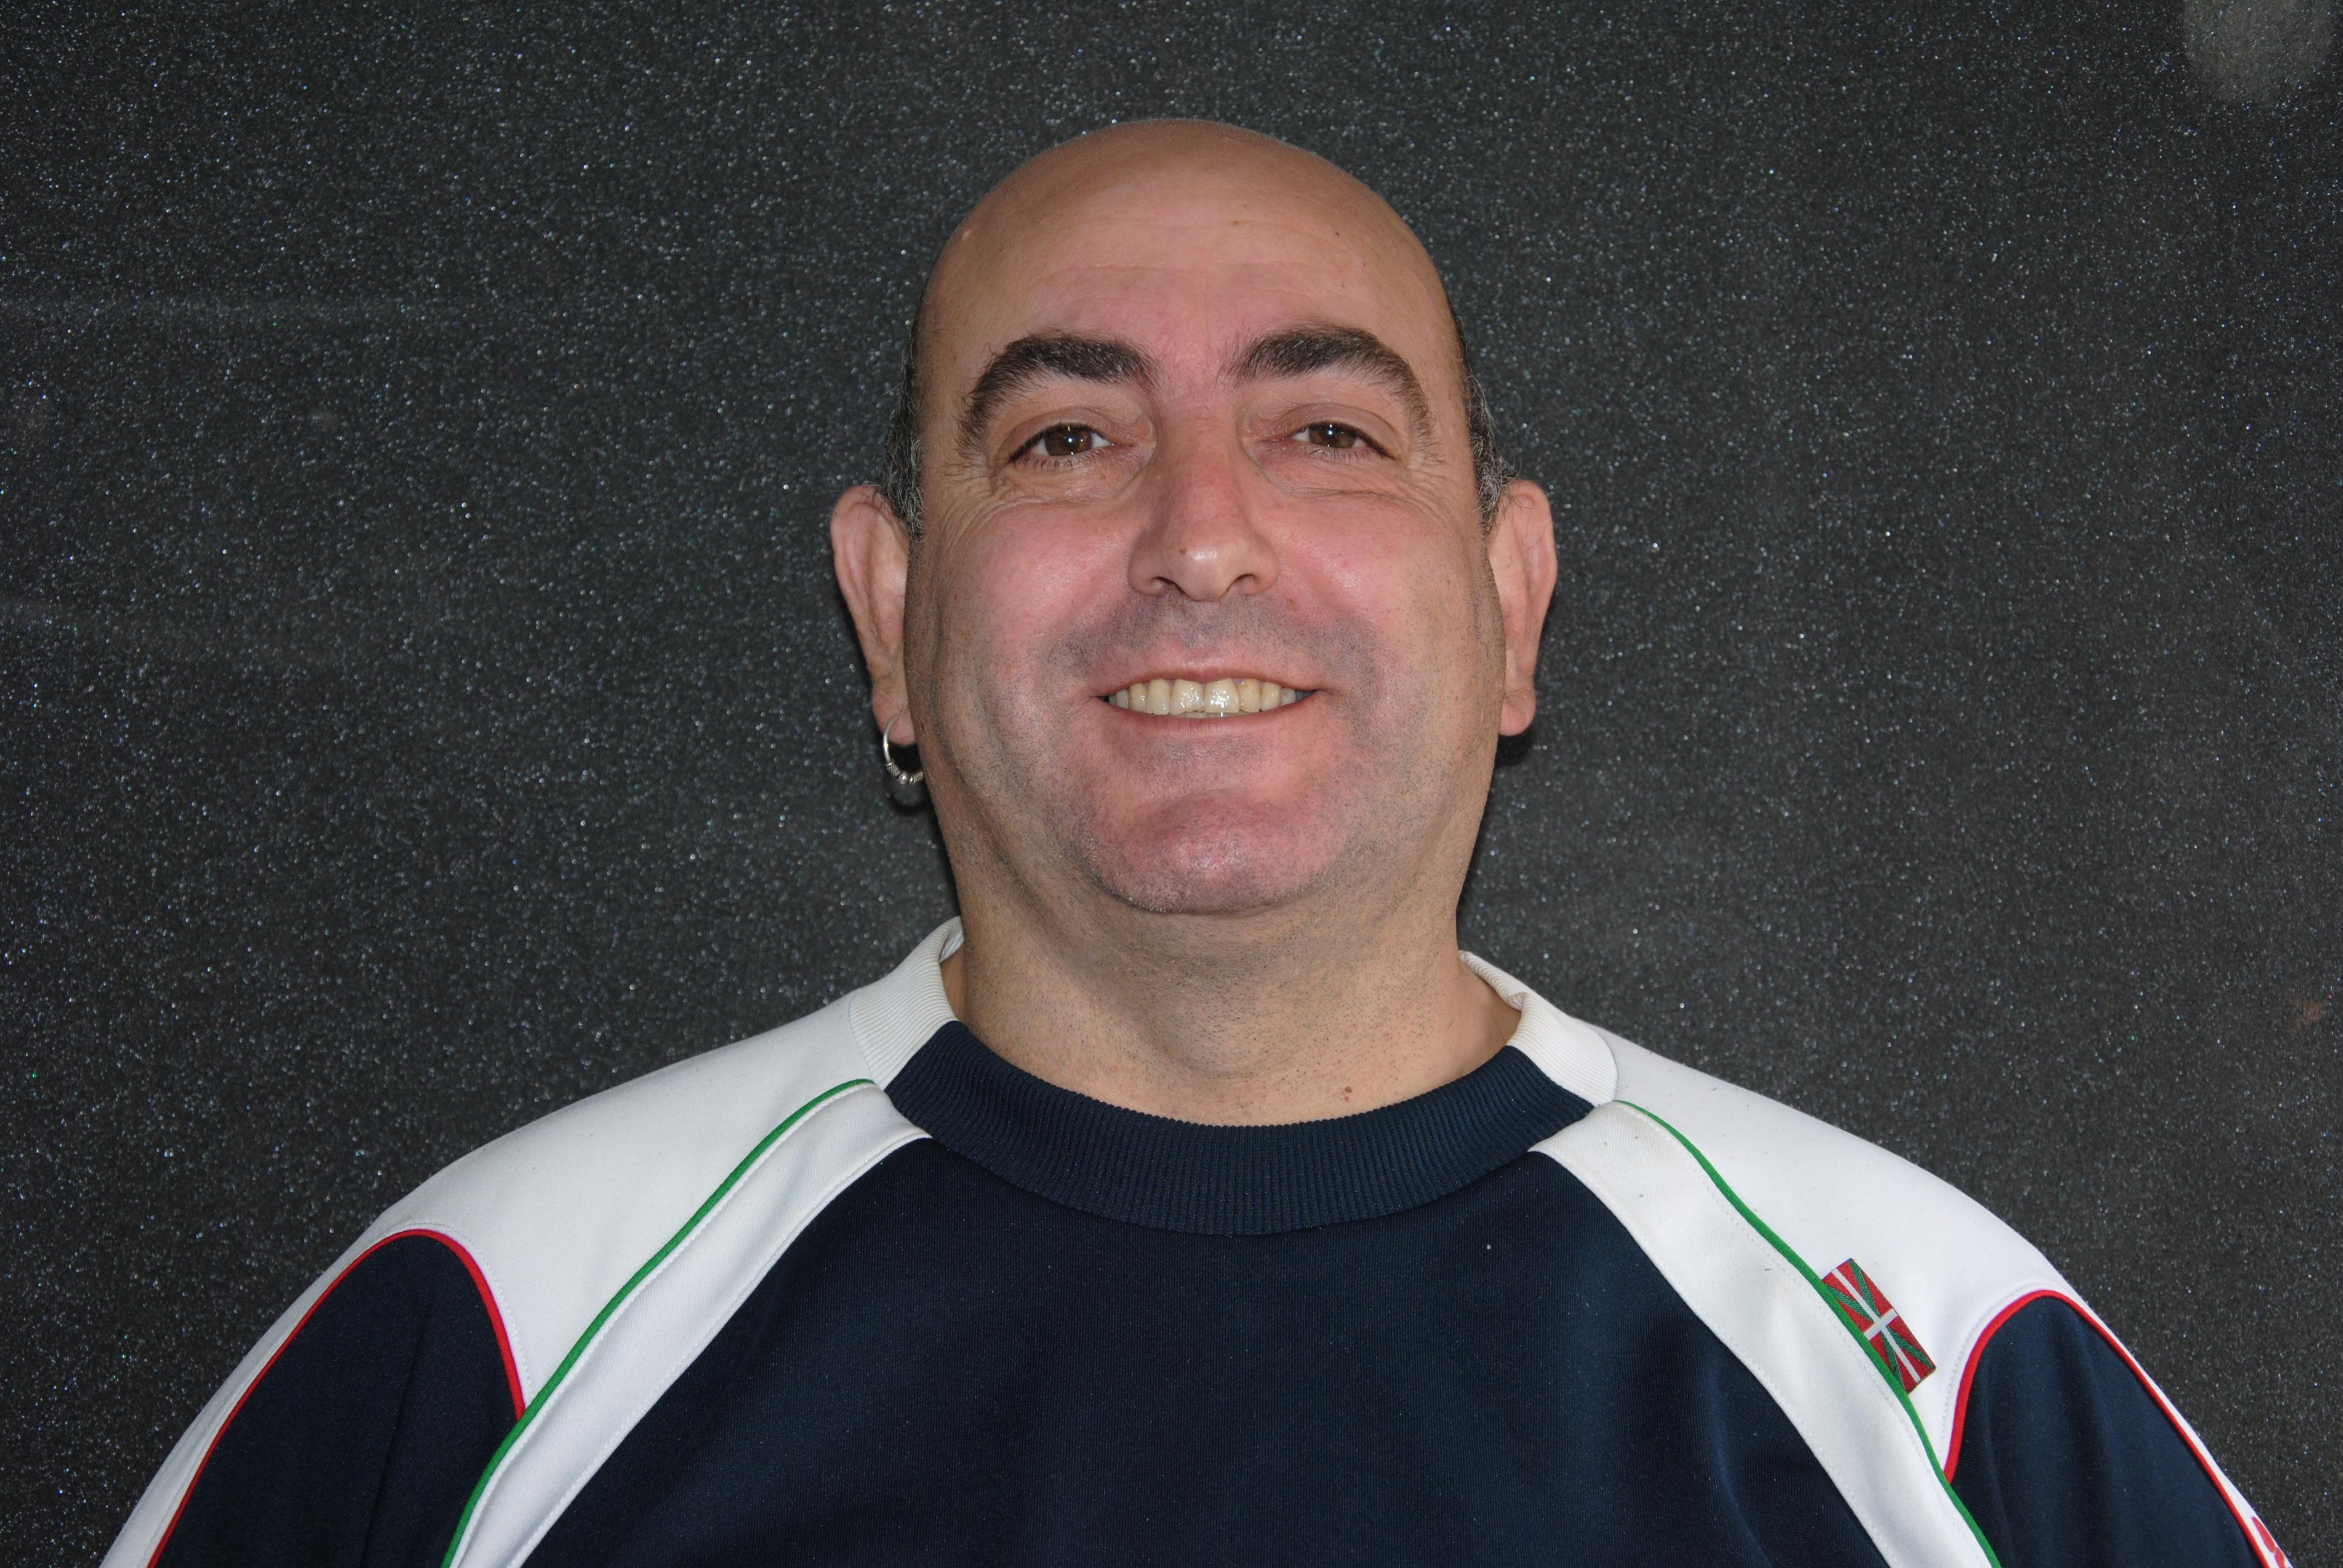 Jesús Nicomedes Fndz-Cañadas